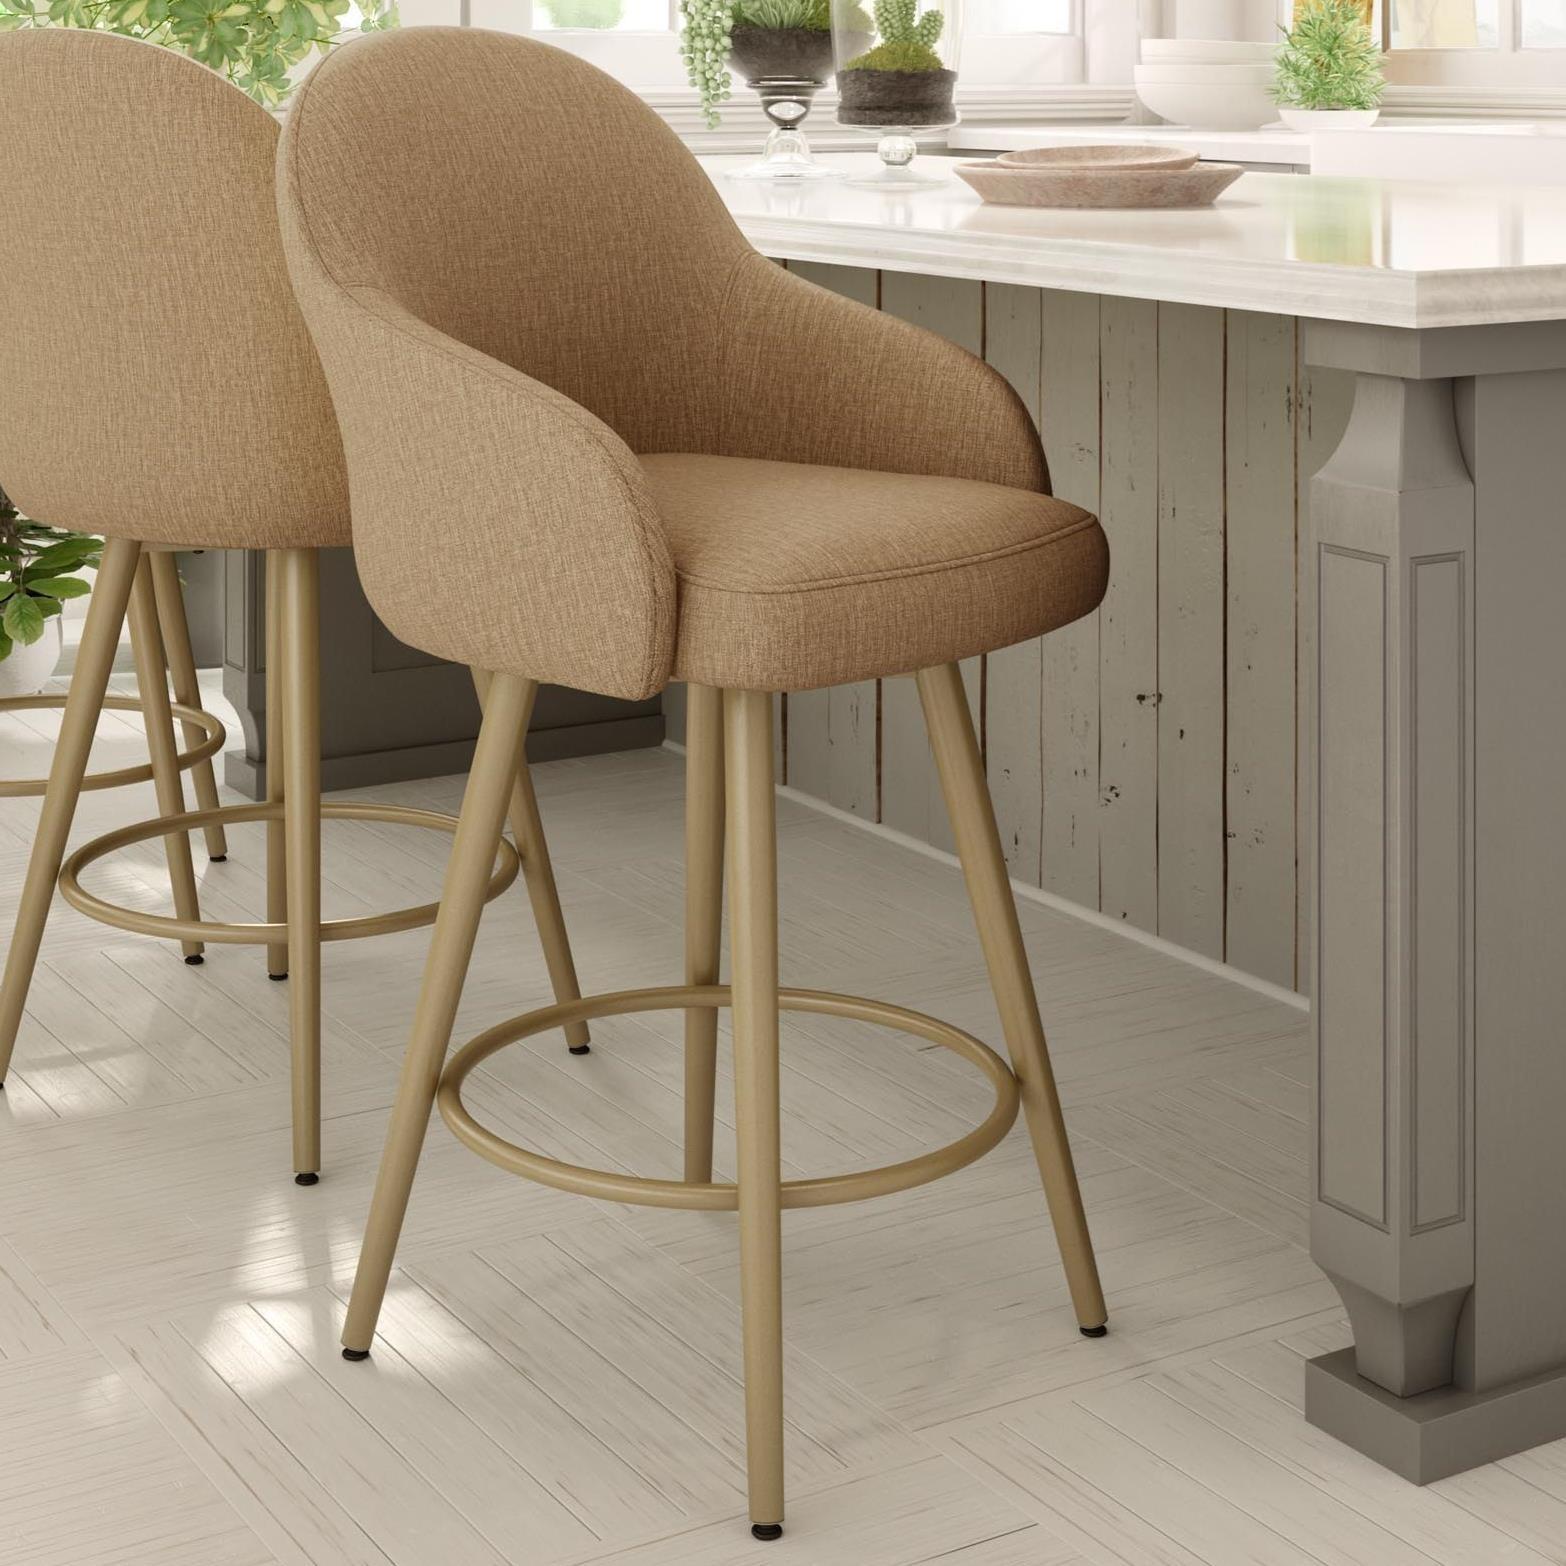 Amisco boudoir 26 weston swivel stool rooms and rest for Boudoir stoel